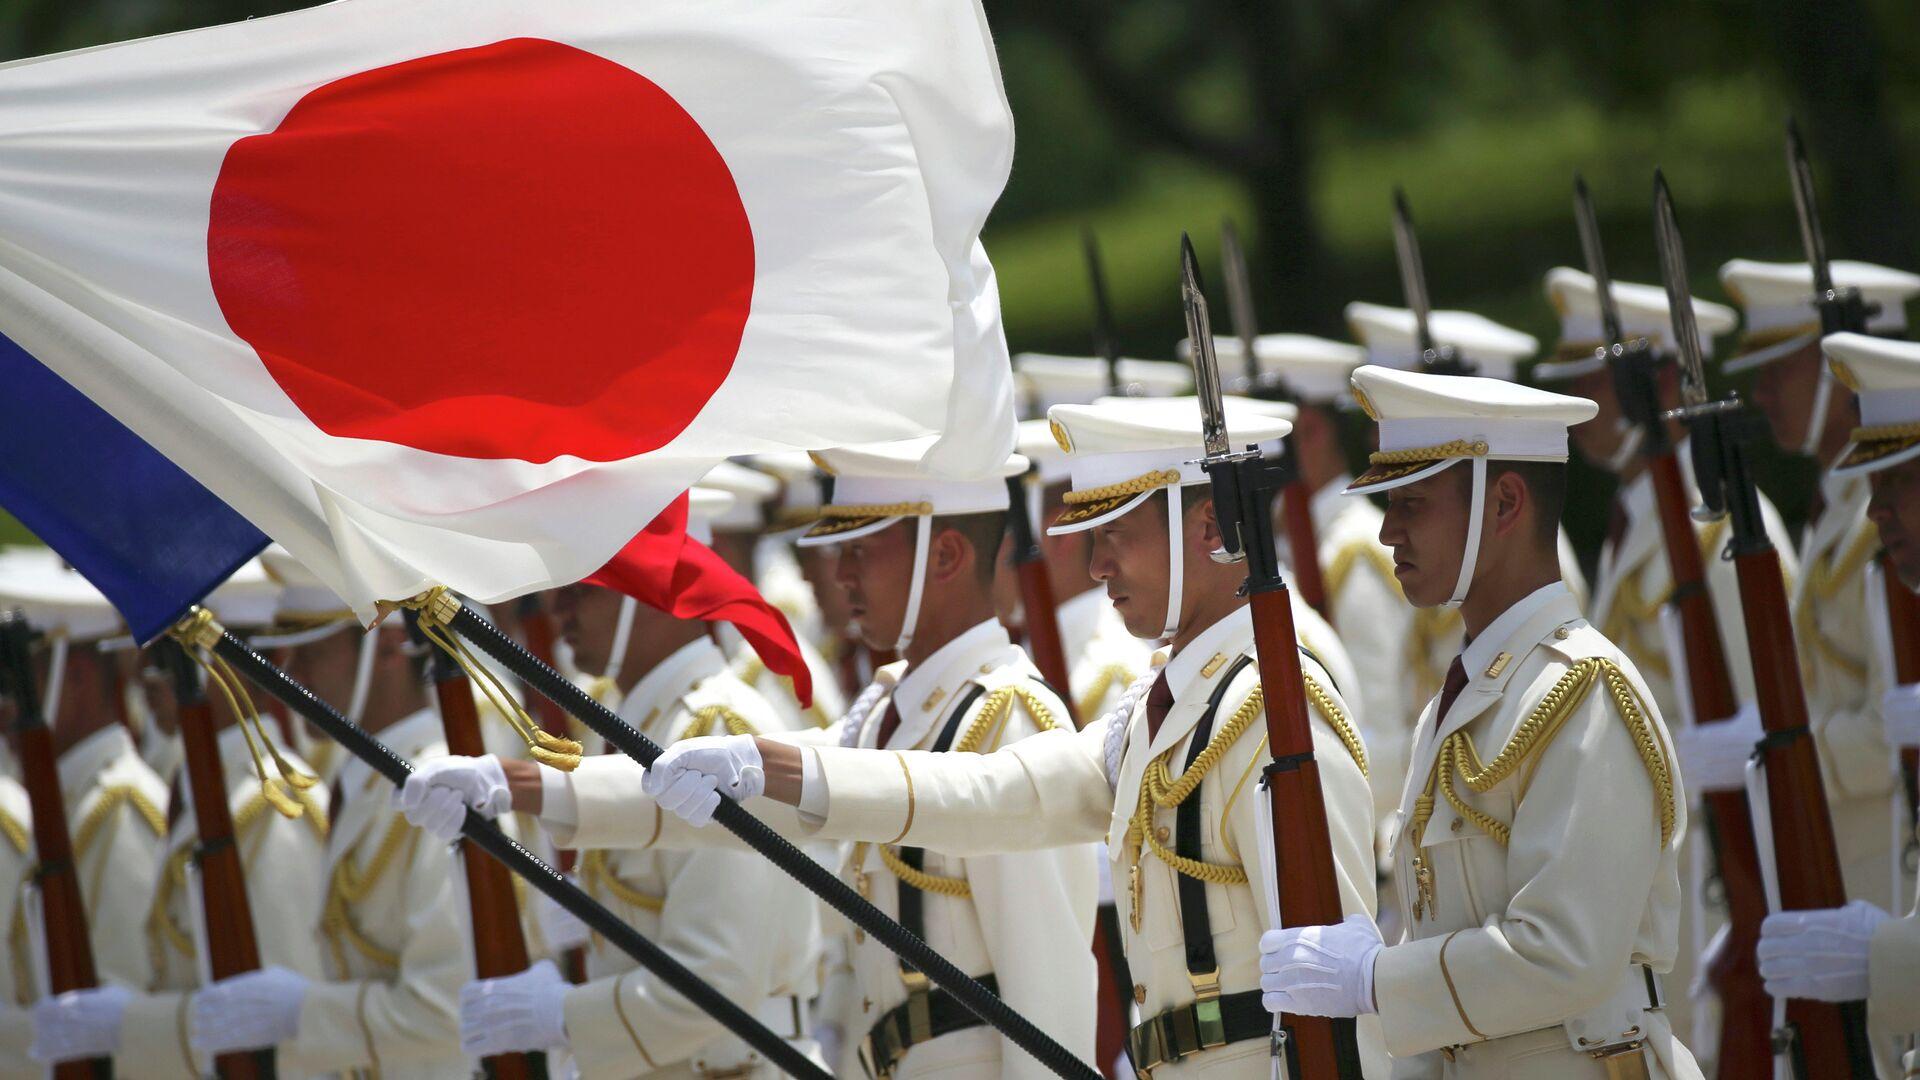 Почетный караул сил самообороны Японии - РИА Новости, 1920, 08.01.2021